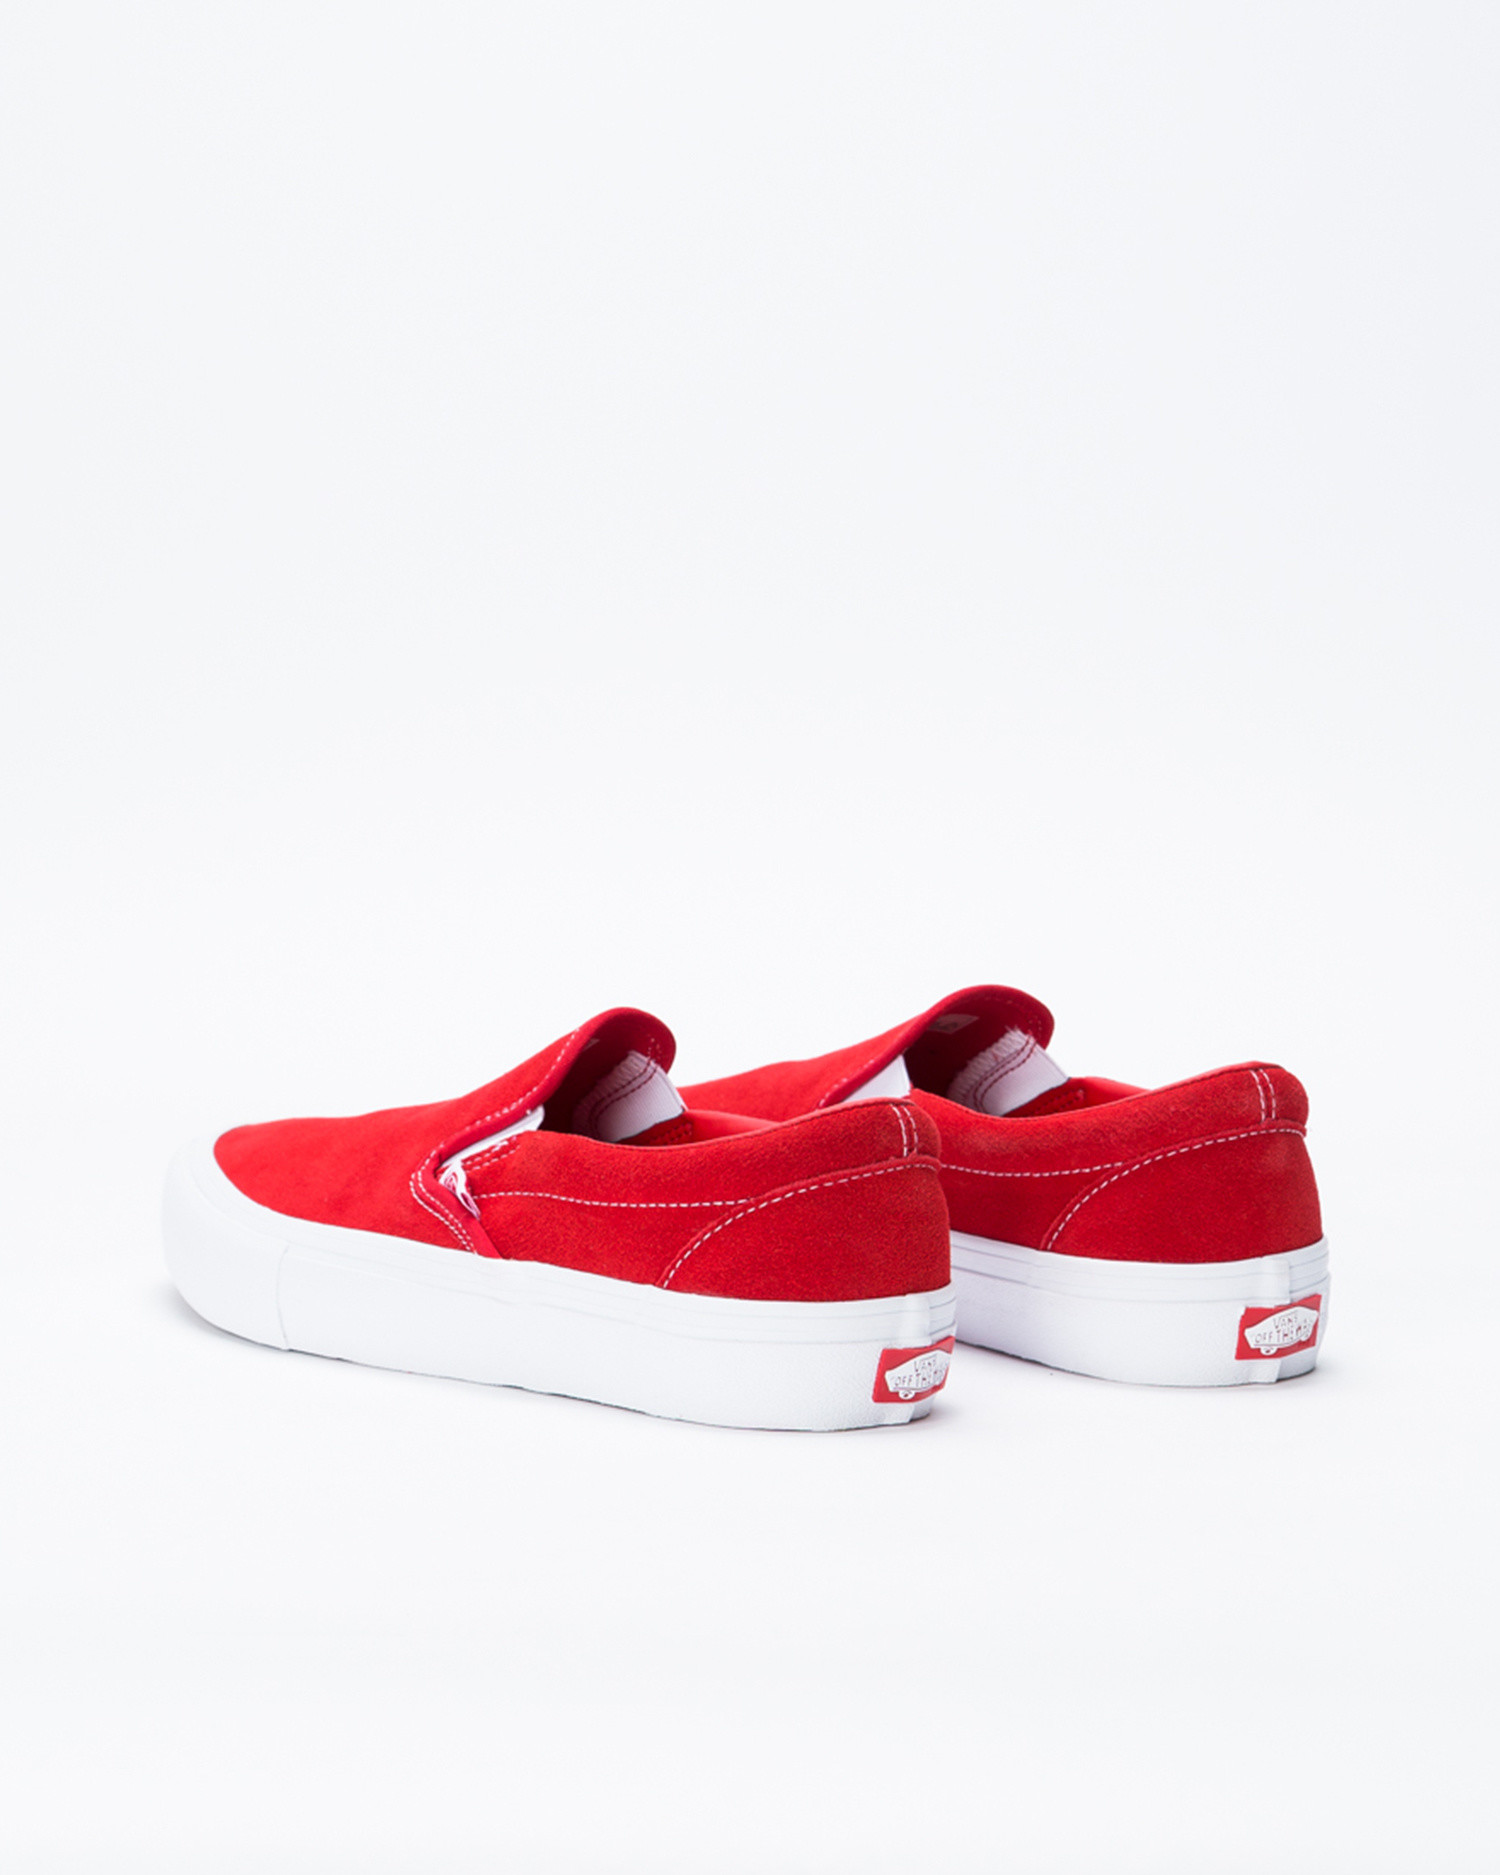 Vans Slip On Pro Suede Red/White